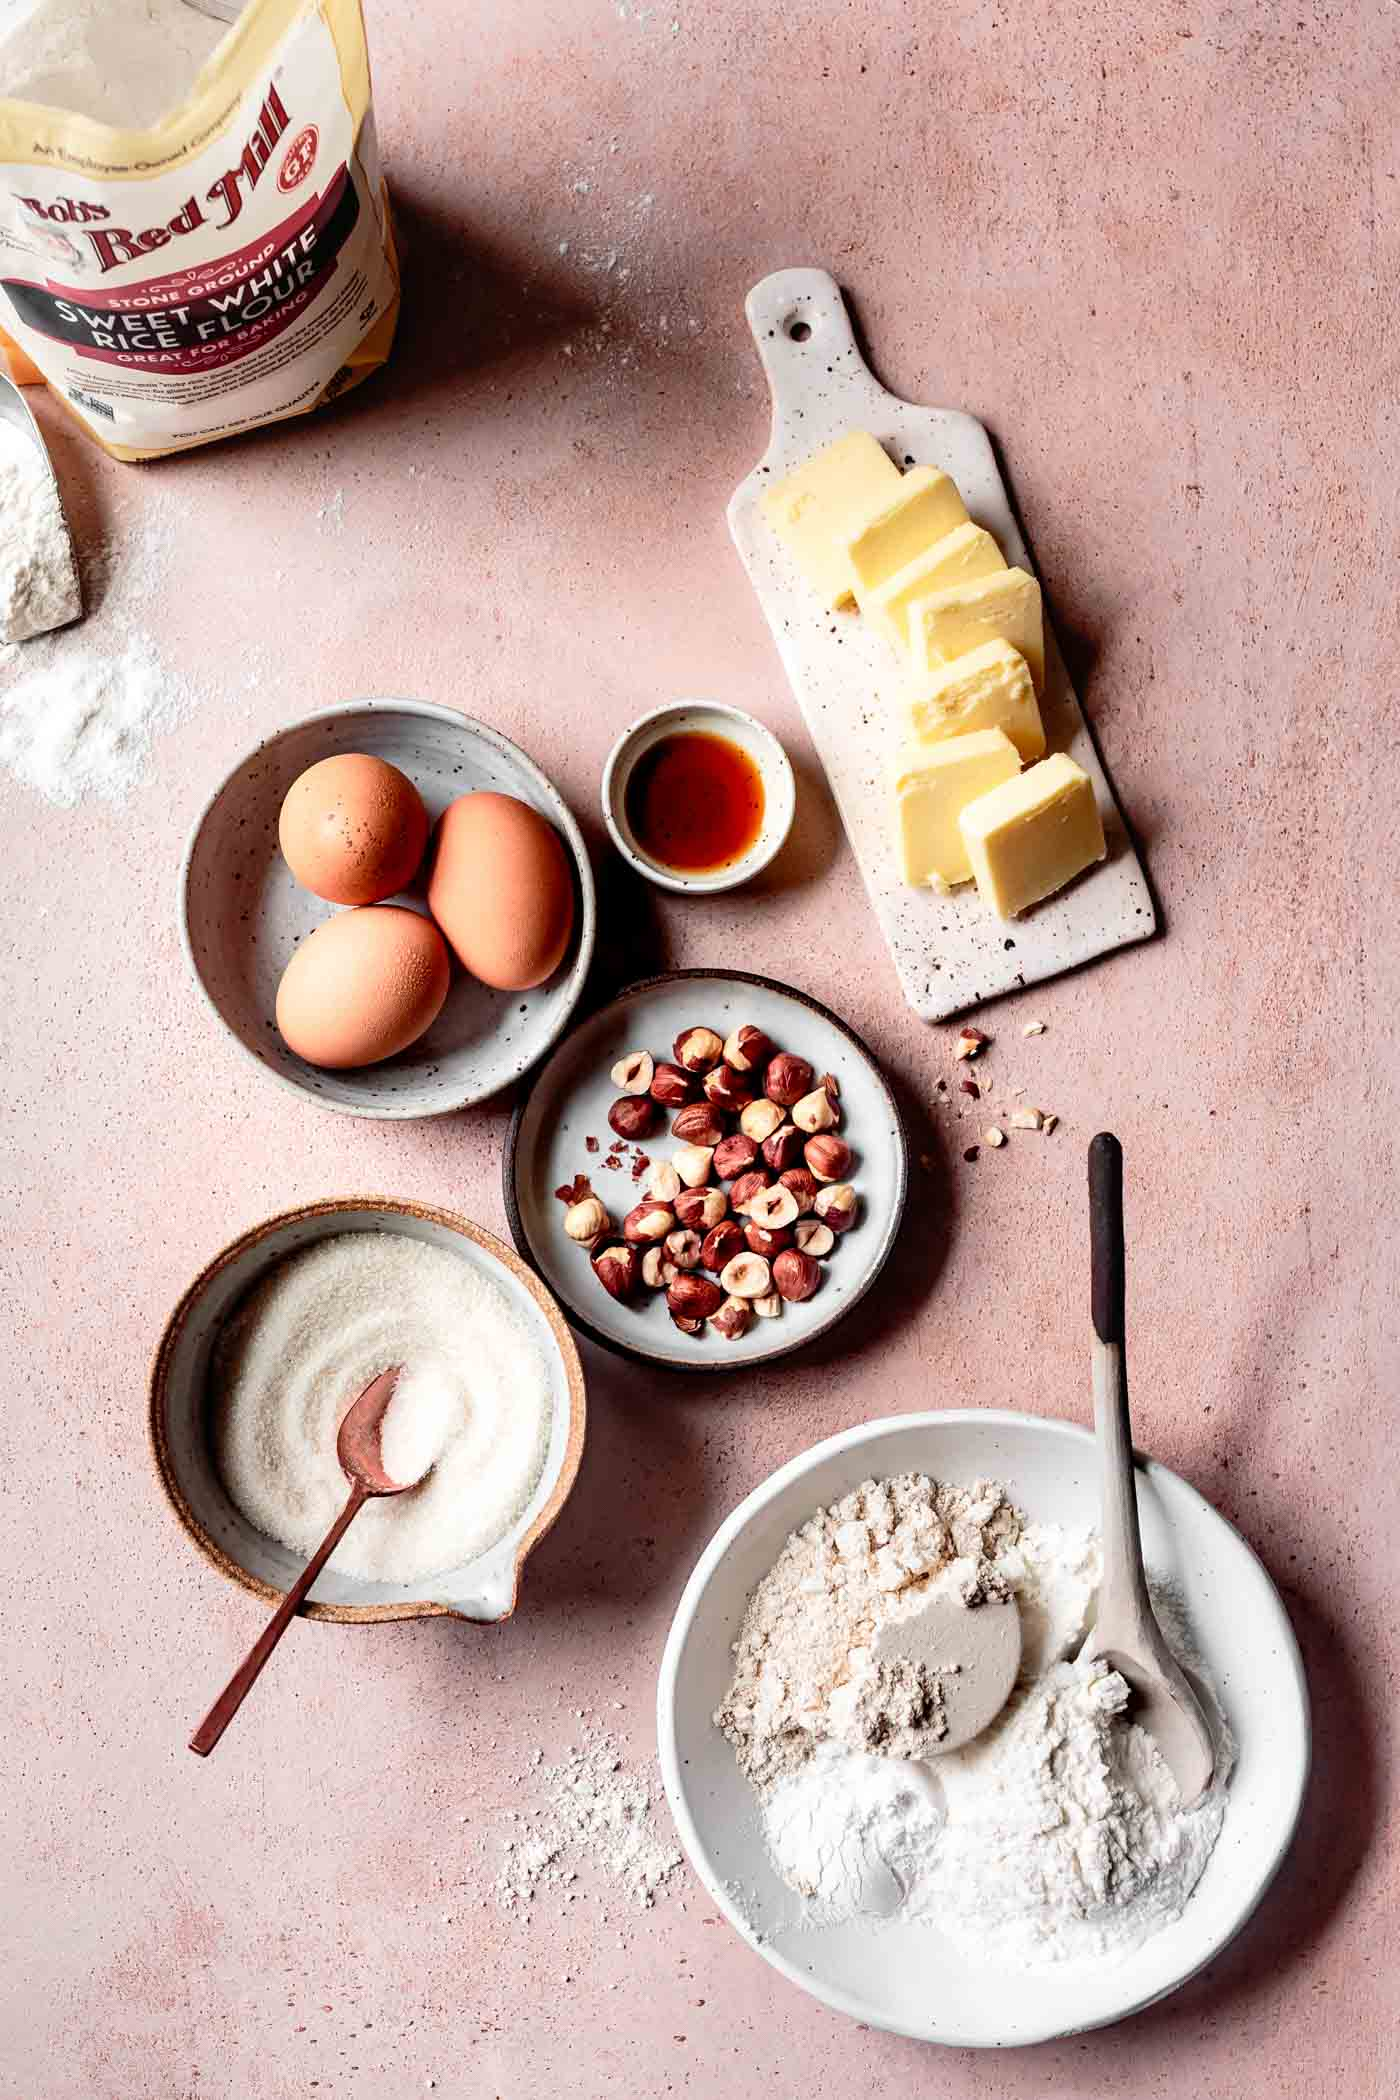 Ingredients for homemade gluten-free almond biscotti recipe